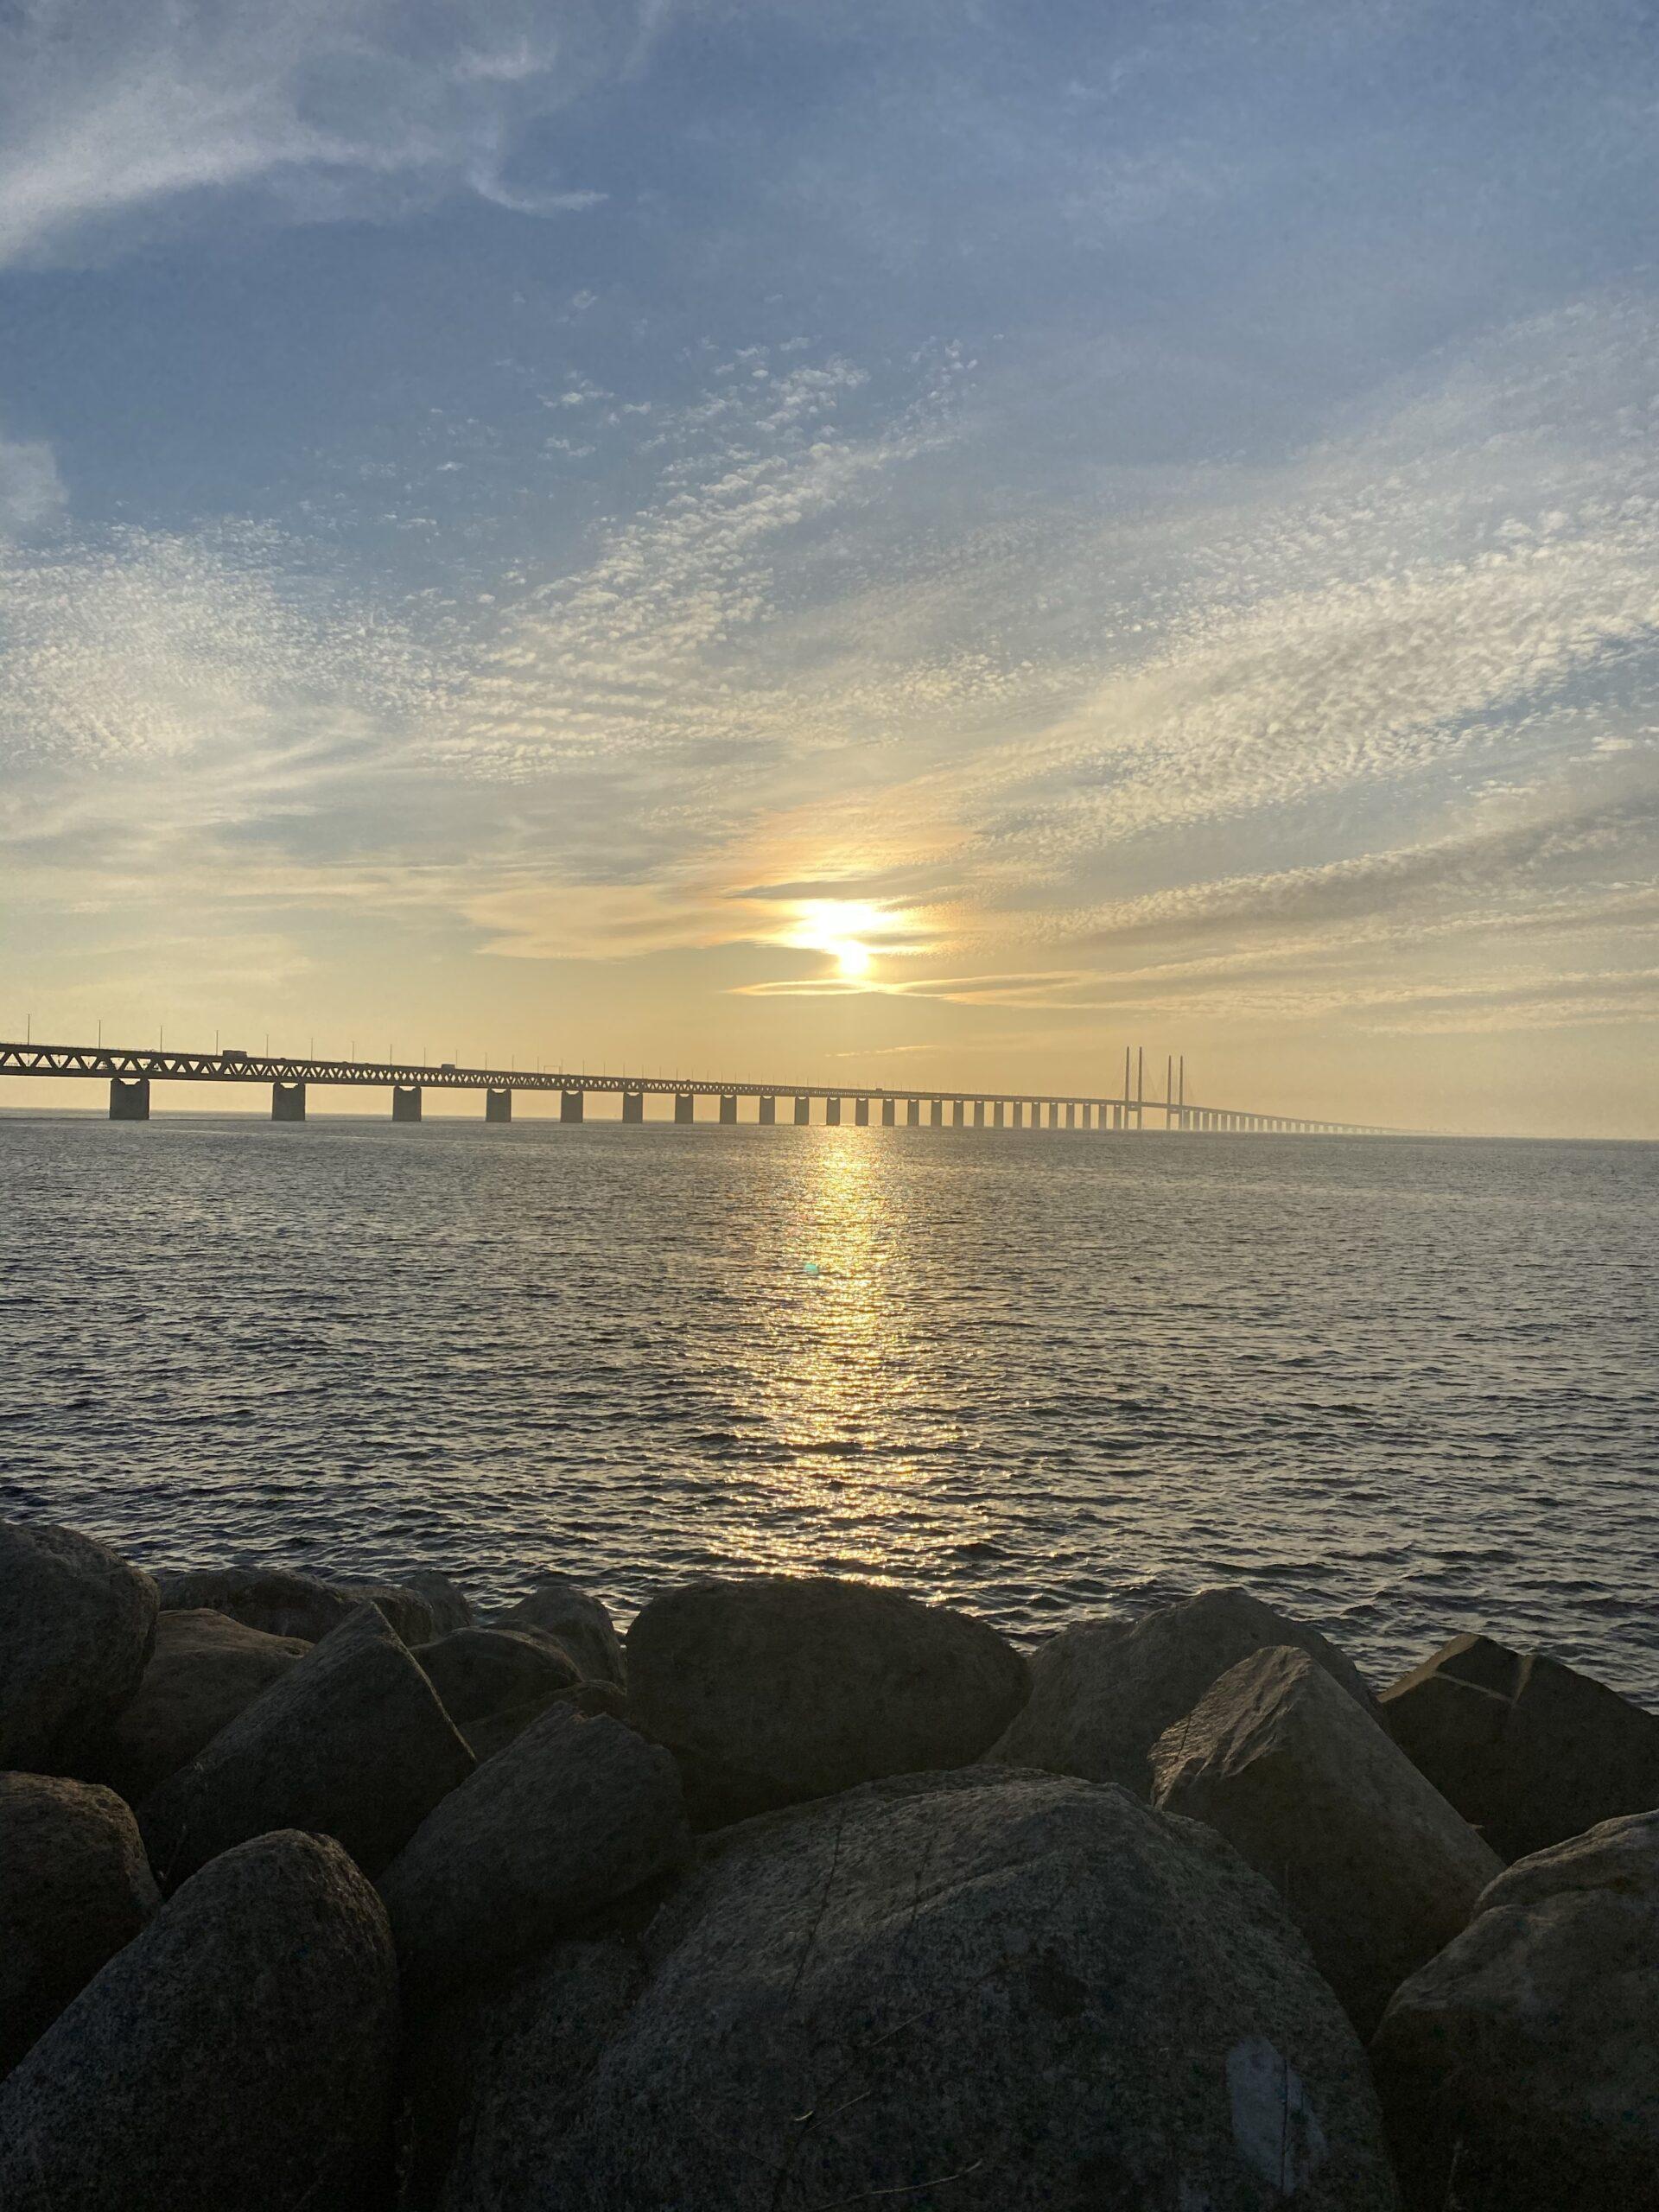 Tränings utmaning, solnedgång & PW